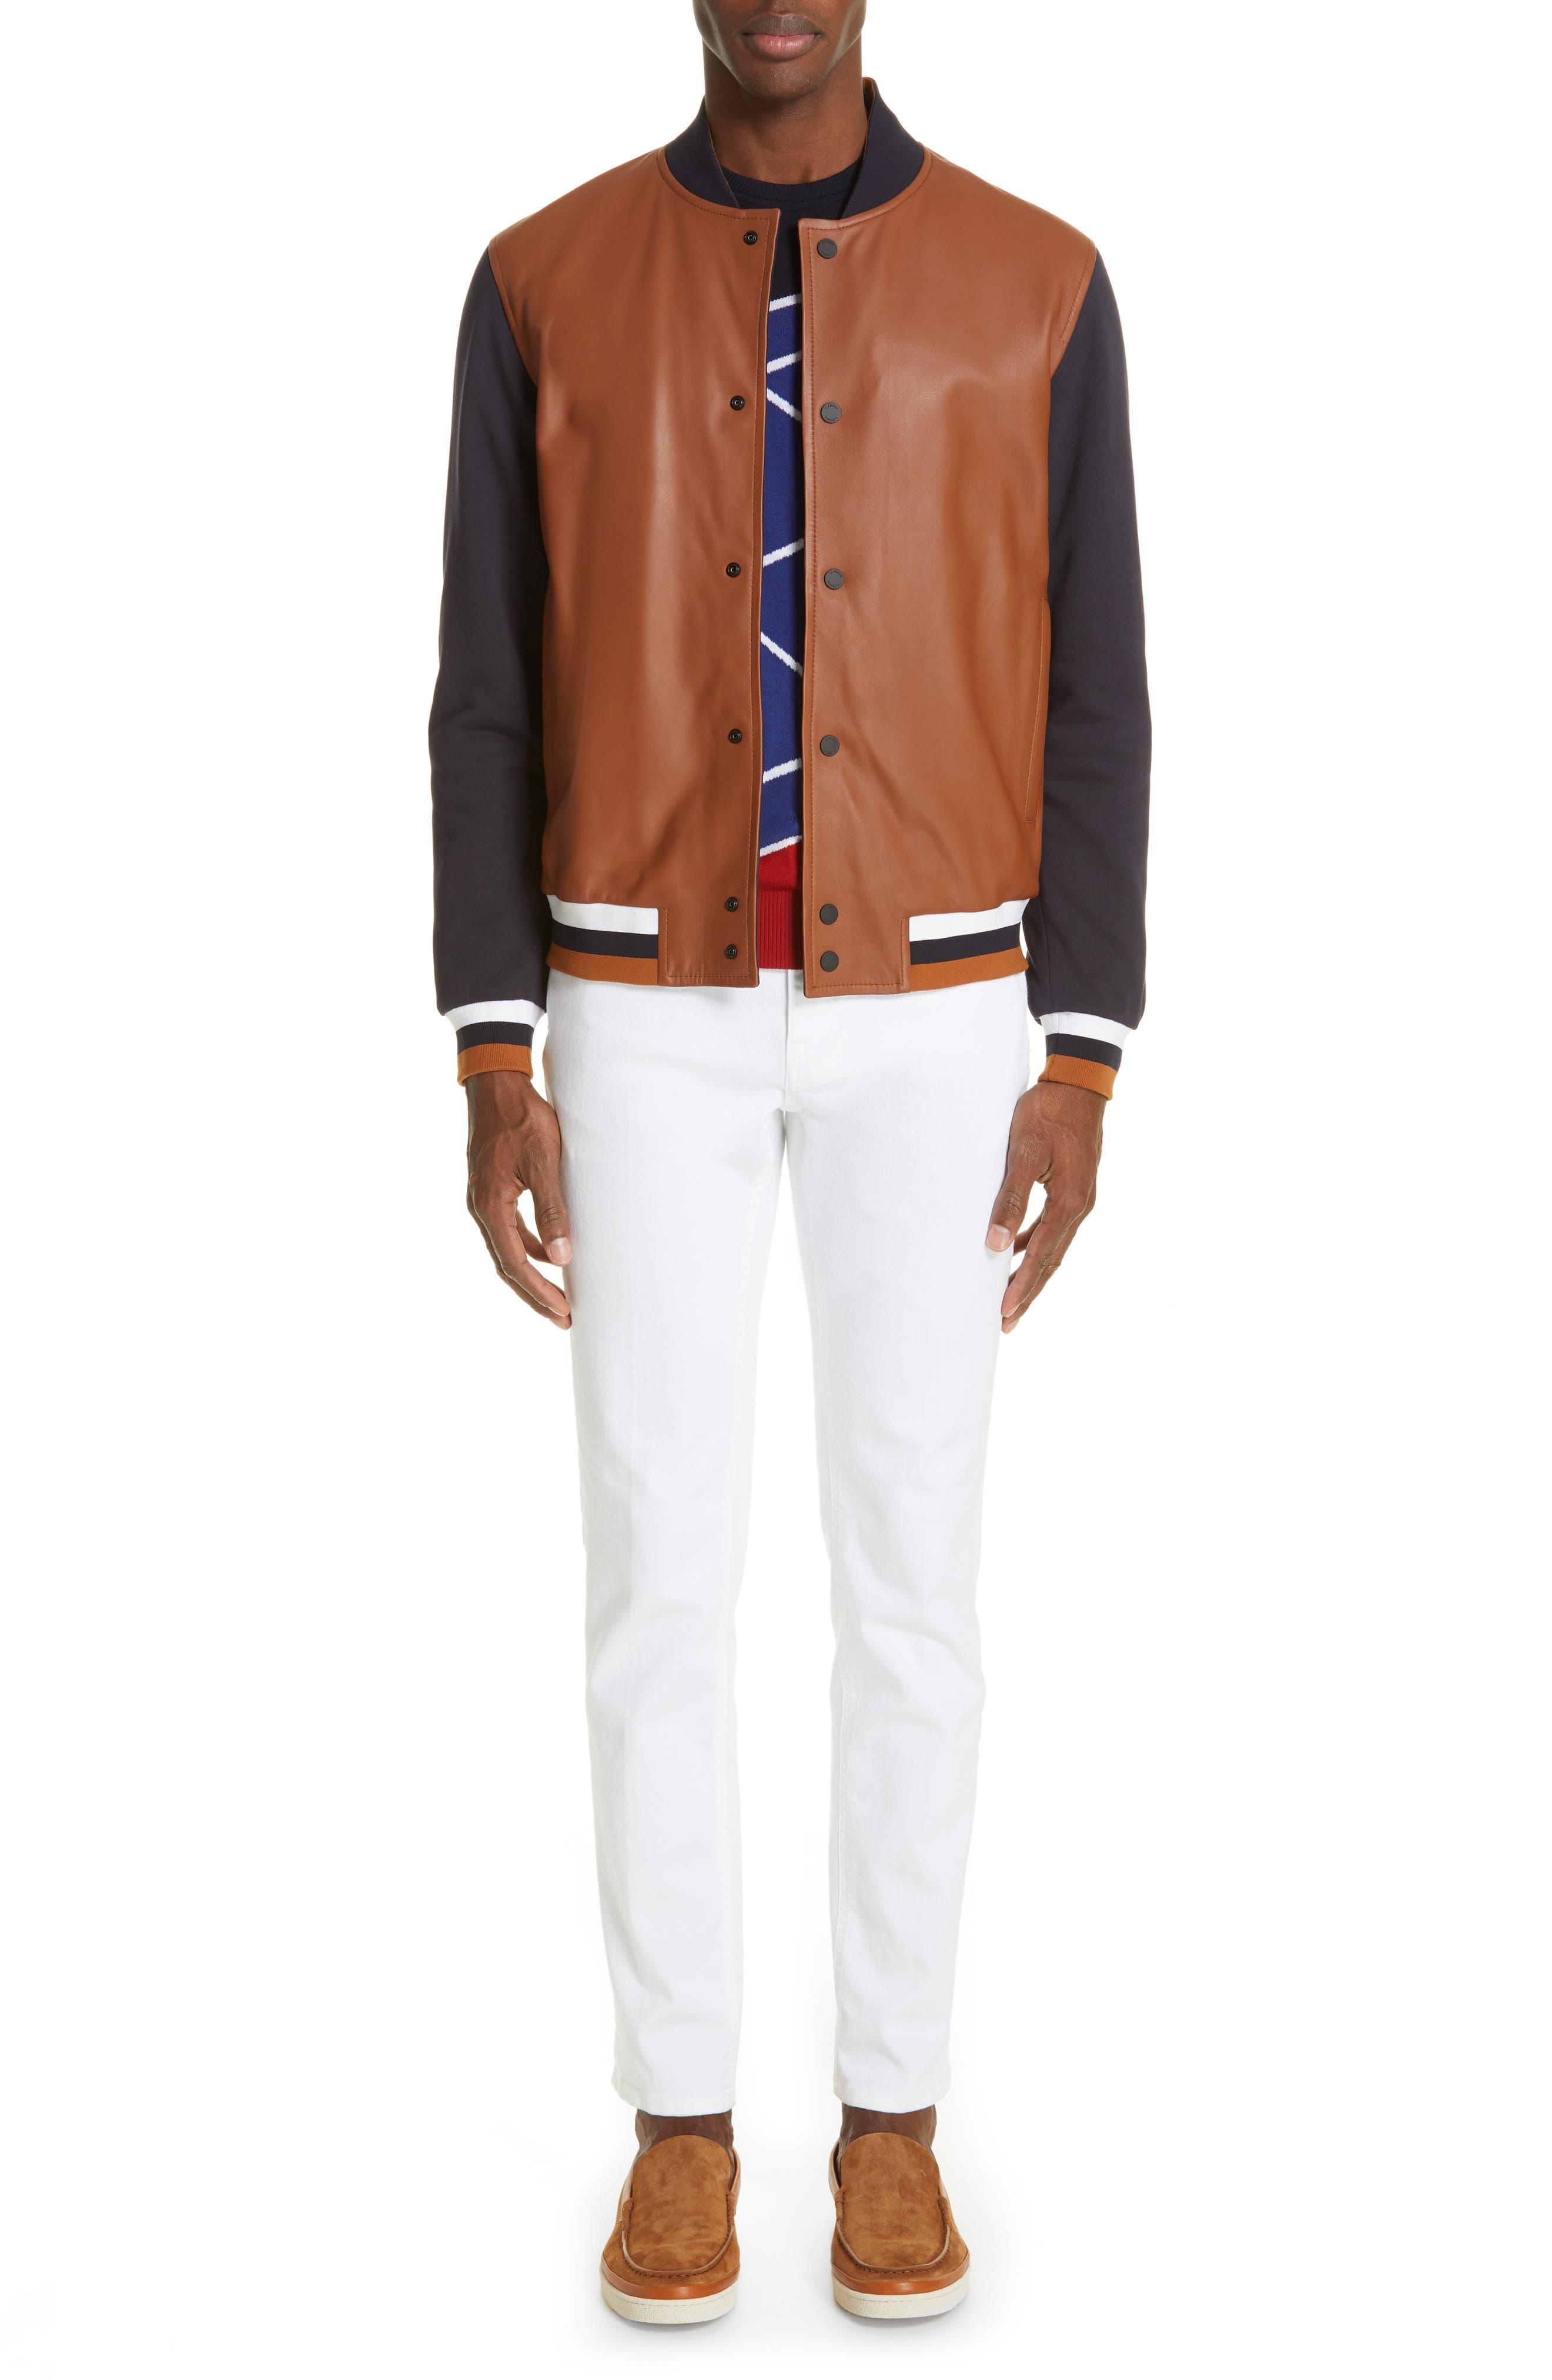 Z ZEGNA, Contrast Leather Bomber Jacket, Alternate thumbnail 7, color, NAVY/ BROWN